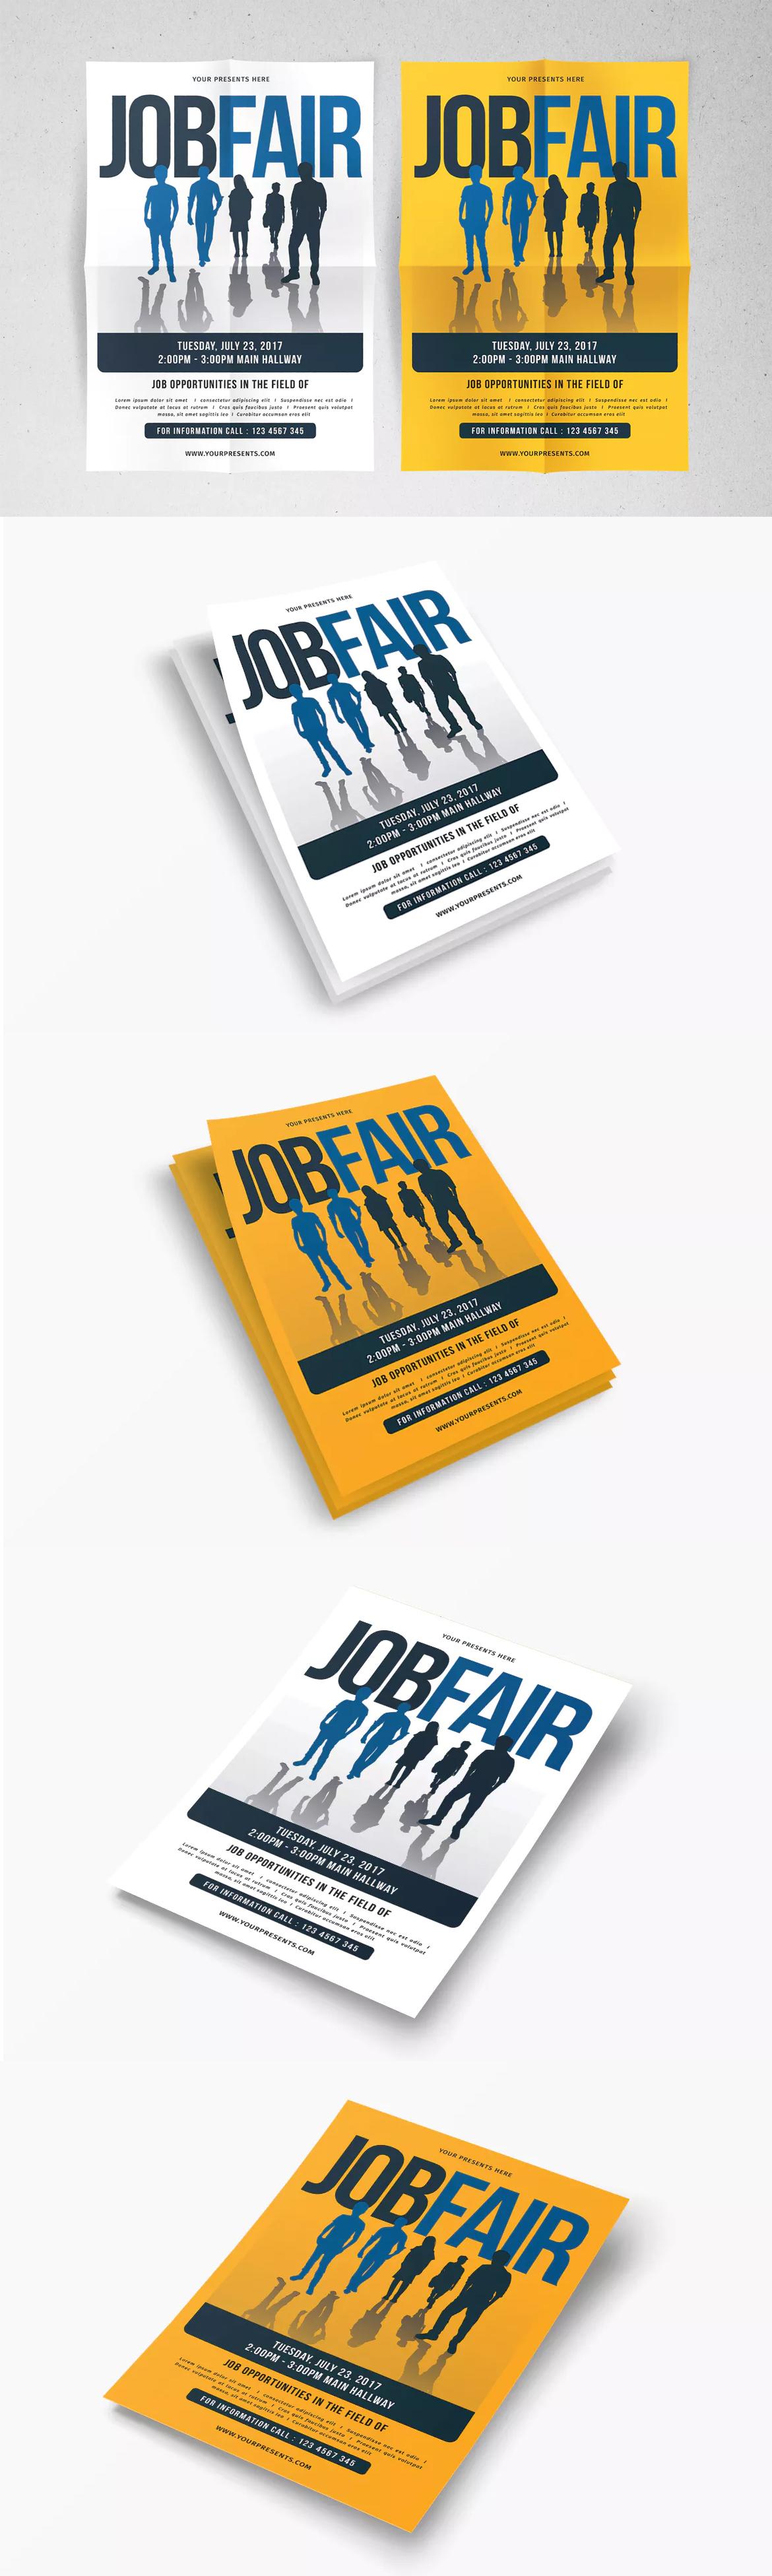 Job fair flyer template ai psd flyer design templates pinterest job fair flyer template ai psd maxwellsz